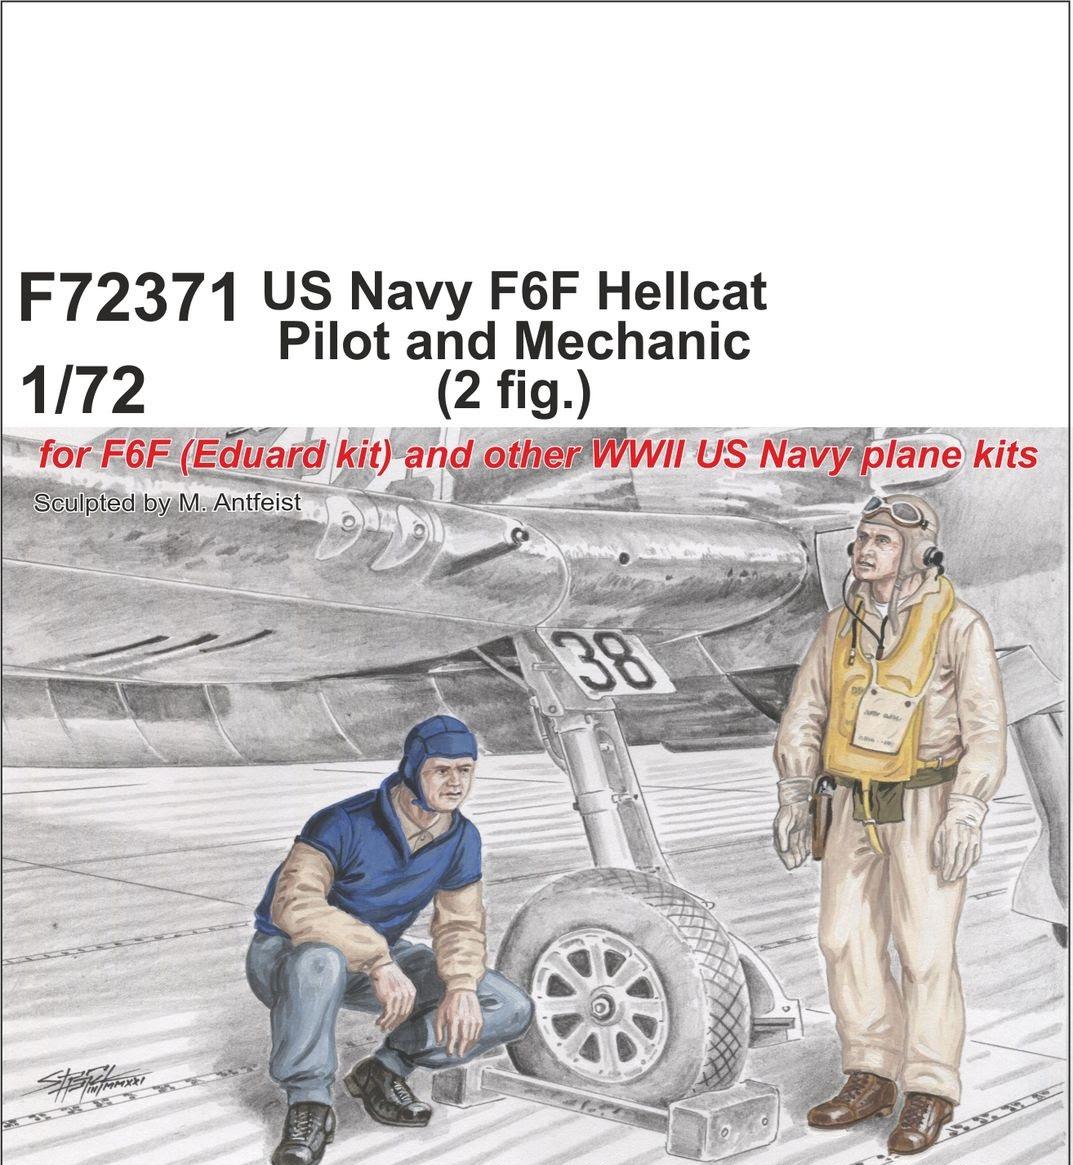 Special Hobby 1/72 US Navy F6F Hellcat Pilot and Mechanic